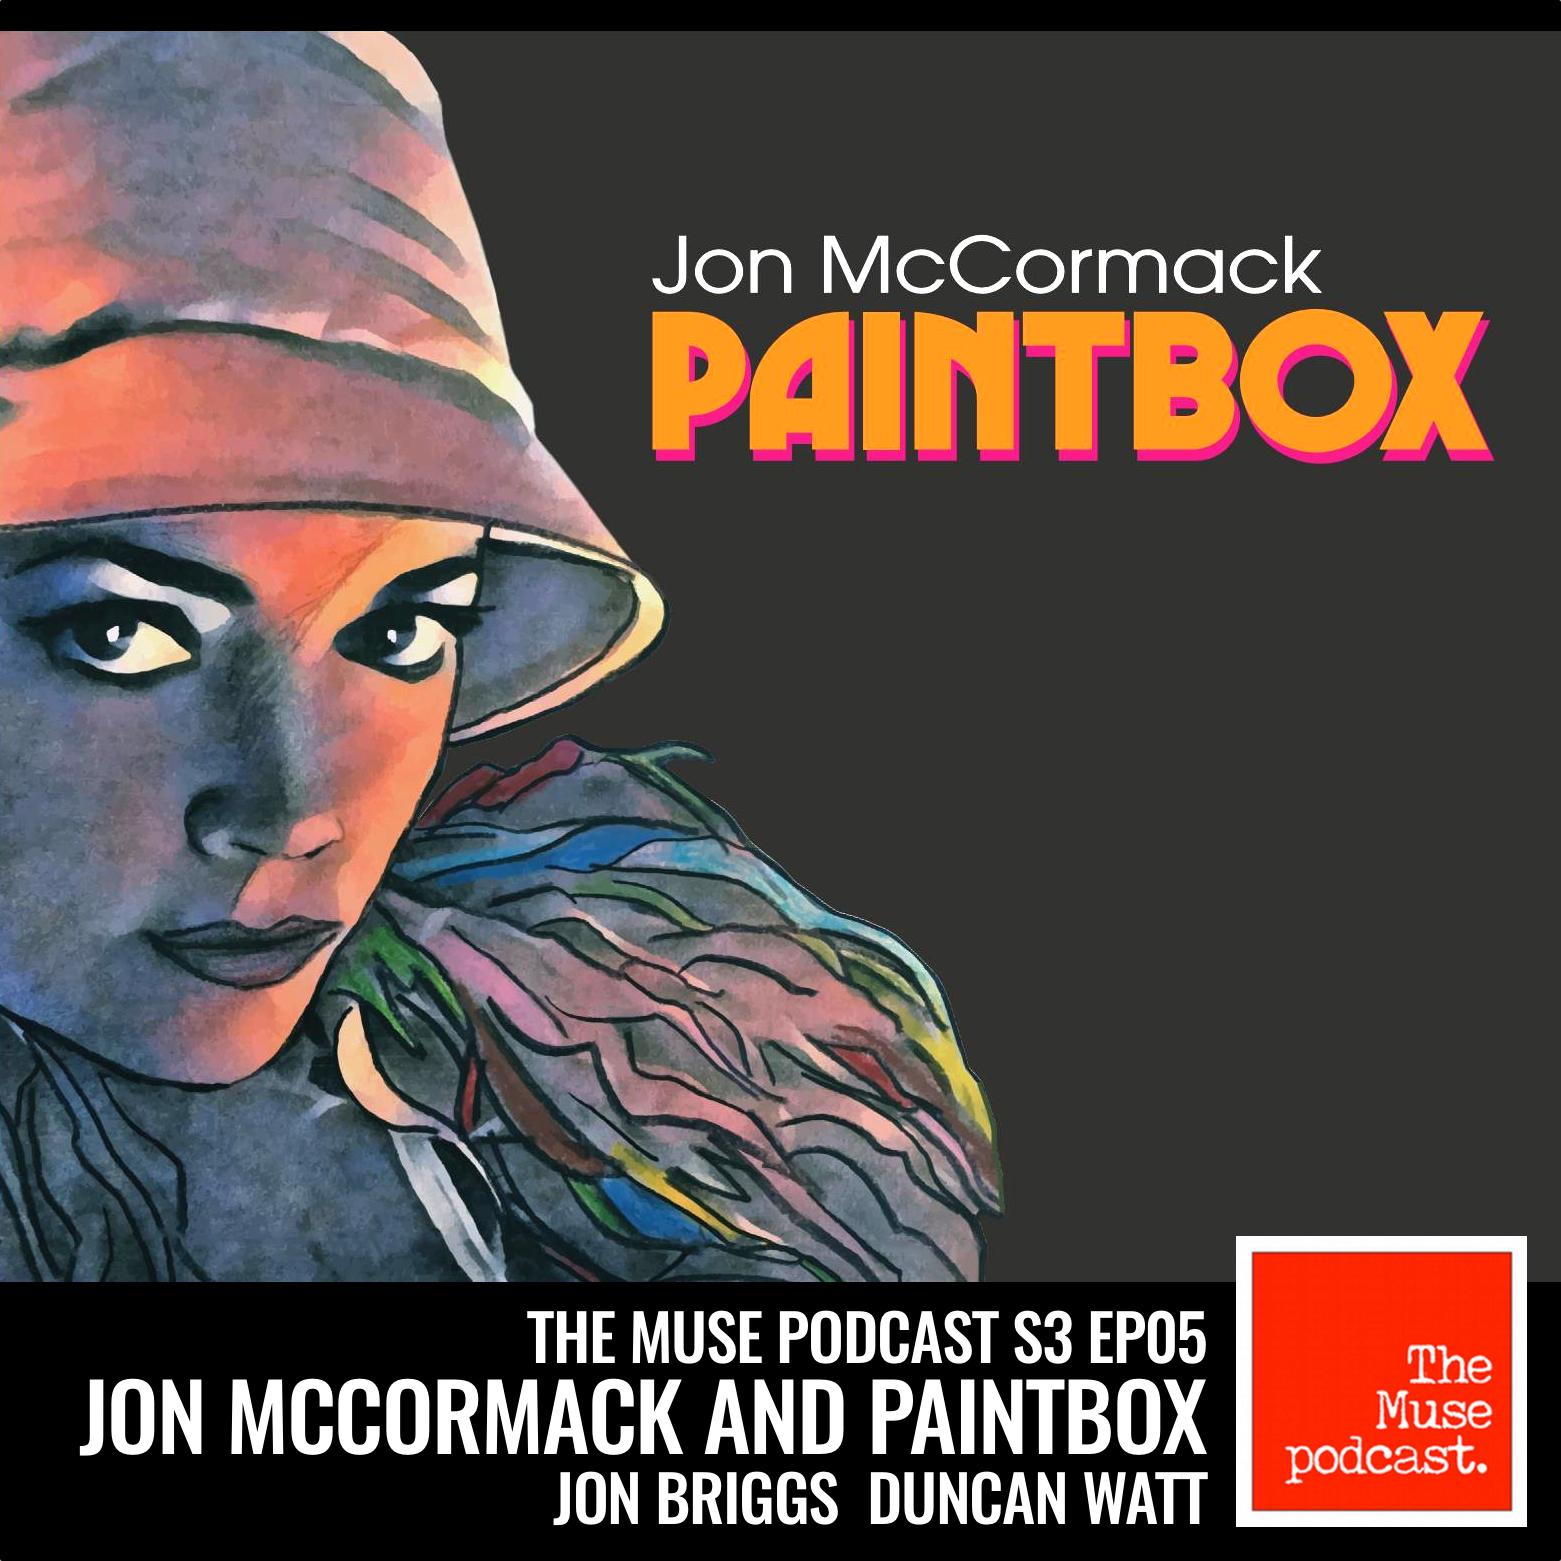 TheMusePodcast_S3Ep05_JonMcCormackAndPaintbox.jpg